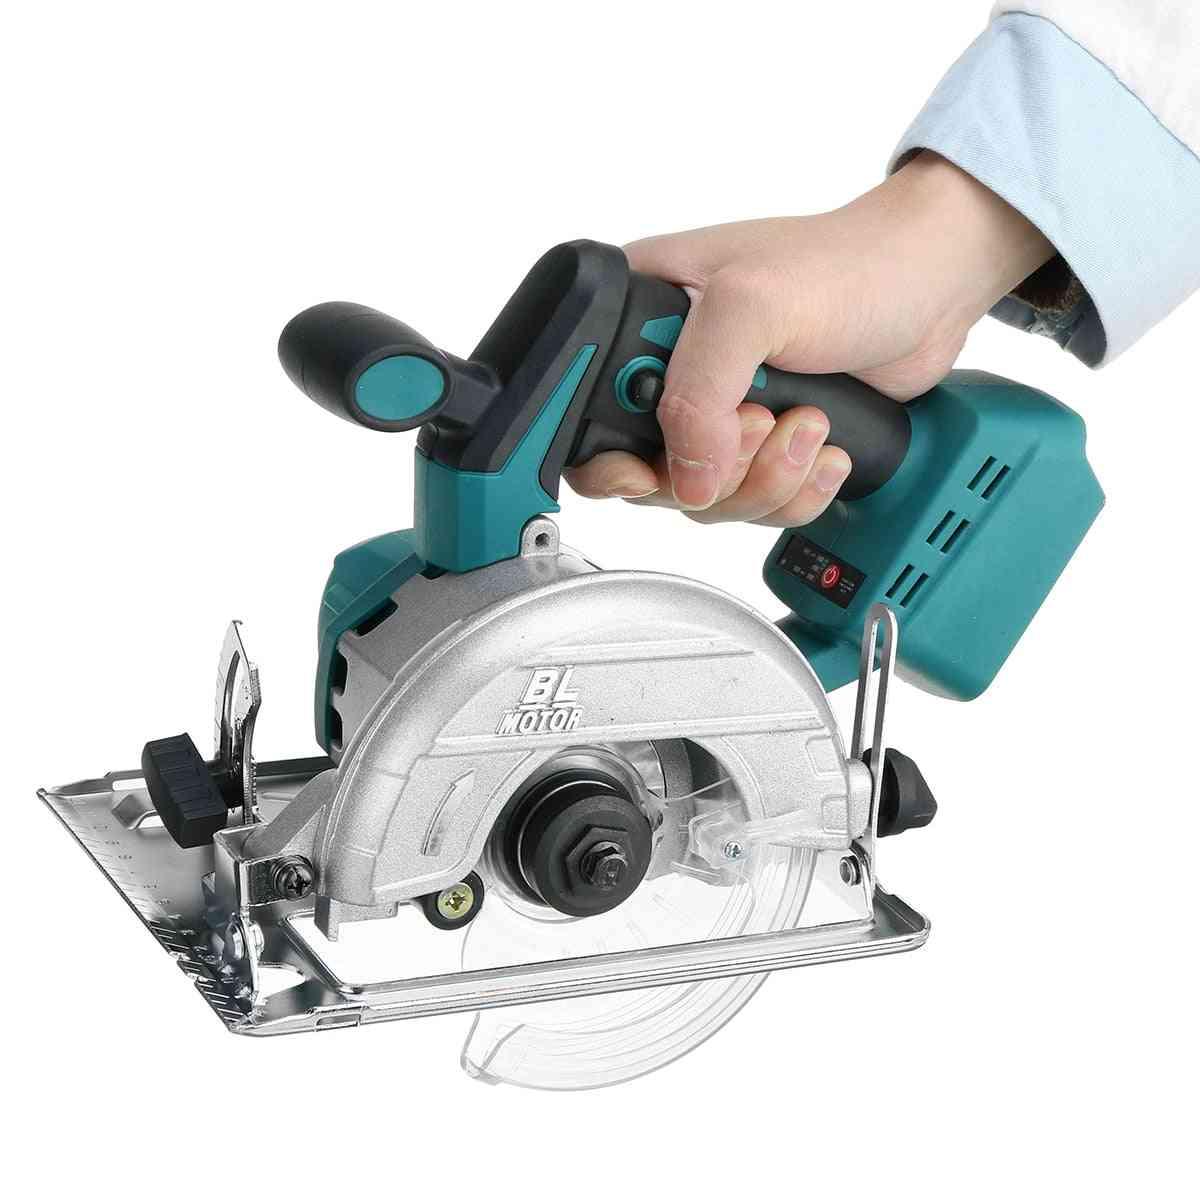 Cordless Electric Circular Wood Cutter